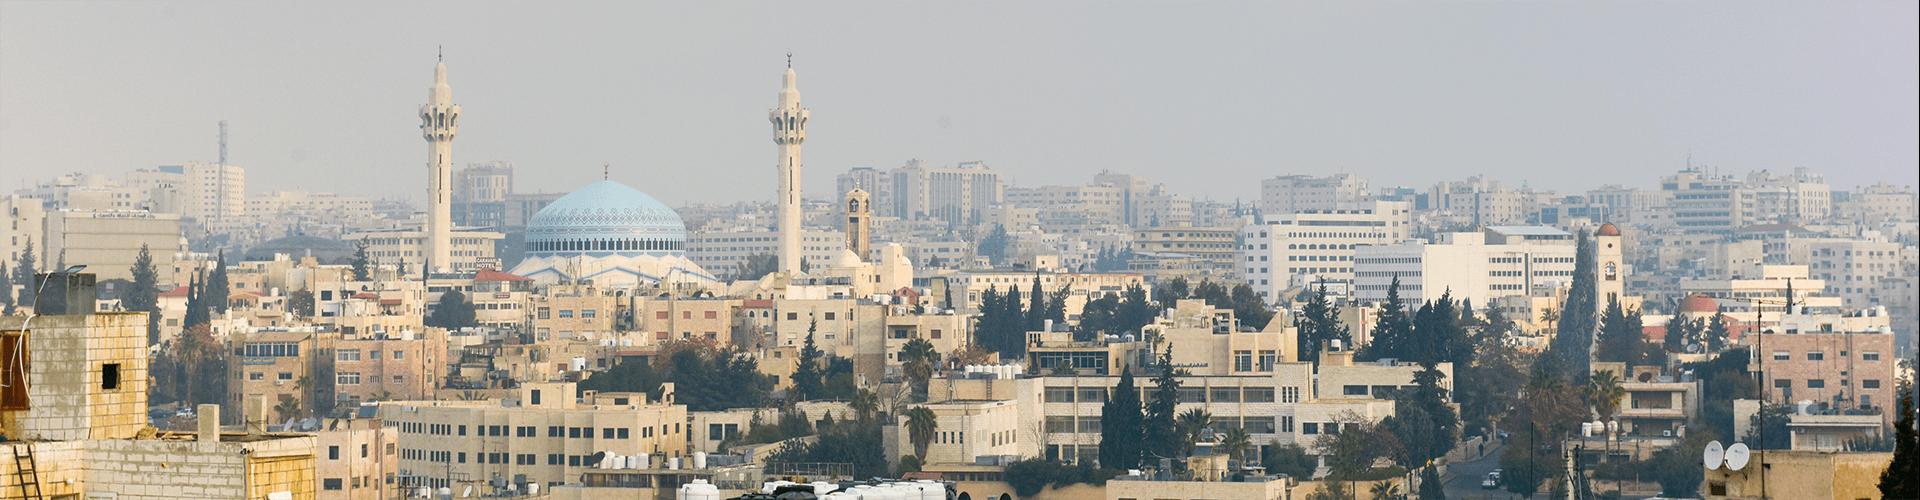 Amman Queen Alia International Airport